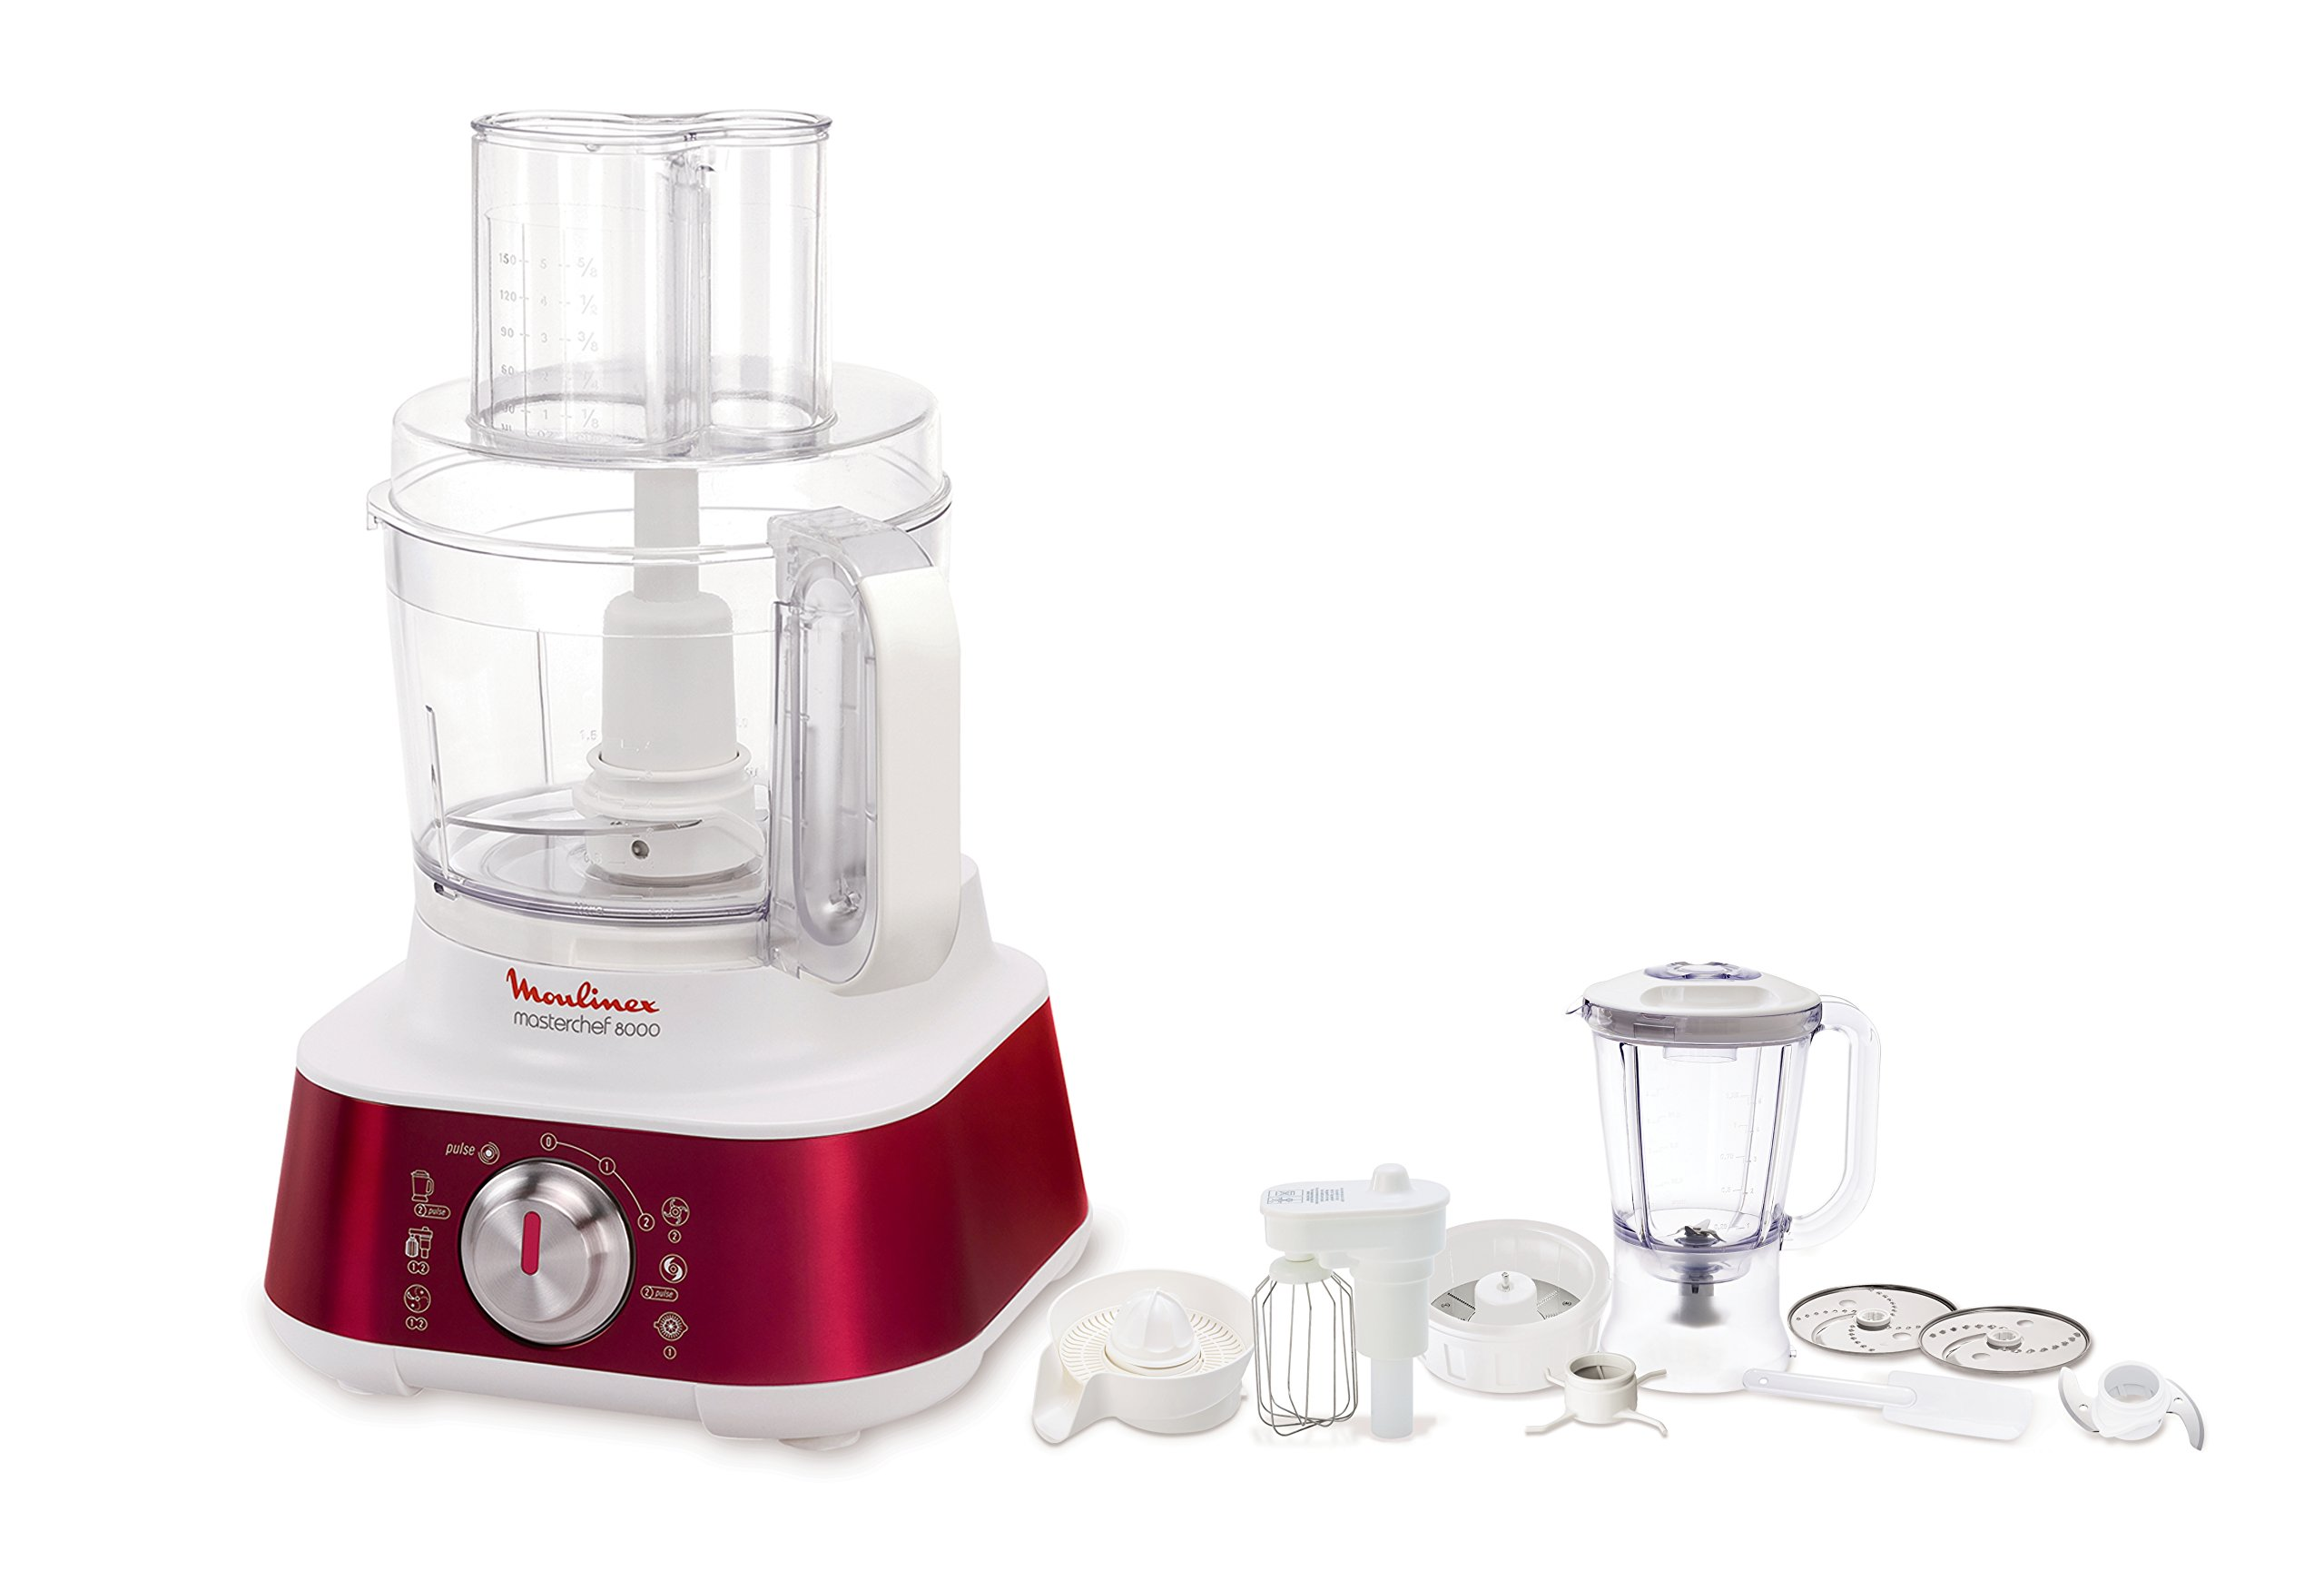 Moulinex Masterchef 8000 850W 3L Rojo - Robot de cocina (3 L, Rojo, Giratorio, 1,5 L, 850 W): Amazon.es: Hogar